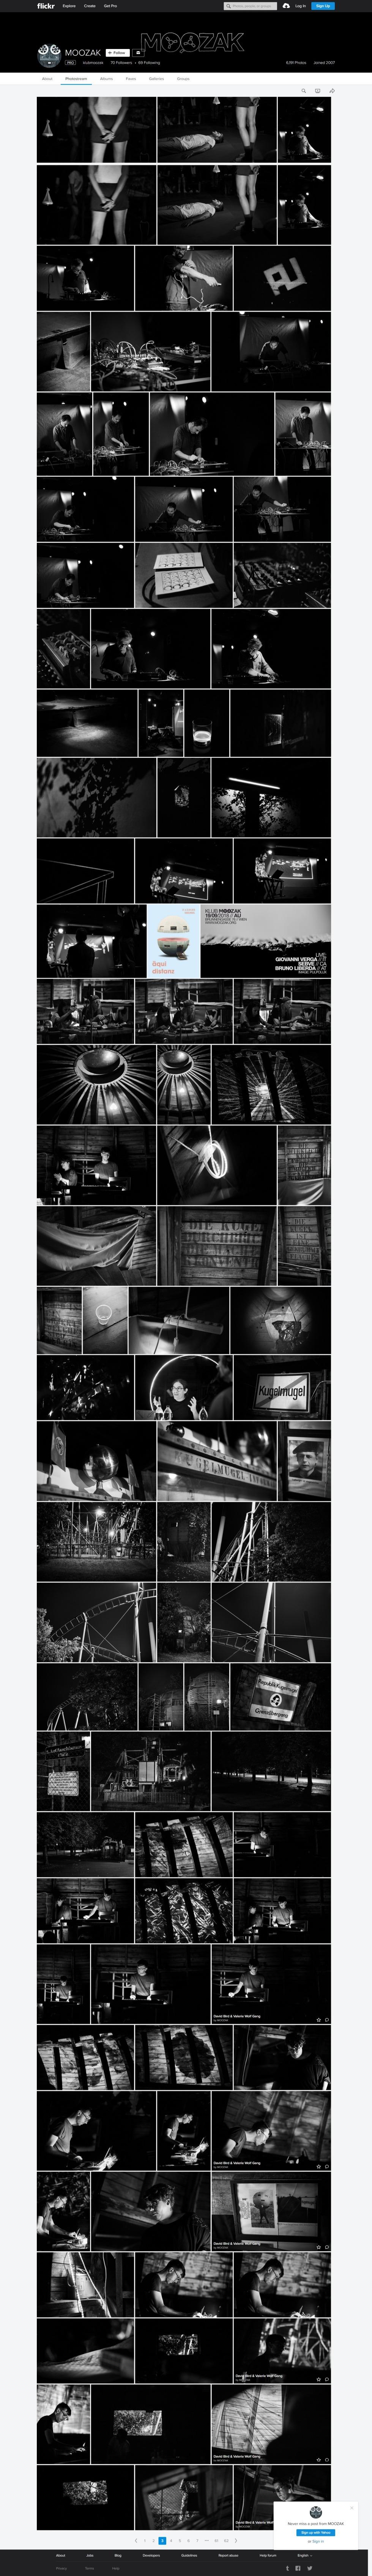 screencapture-flickr-photos-klubmoozak-page3-2018-10-02-12_30_24.jpg